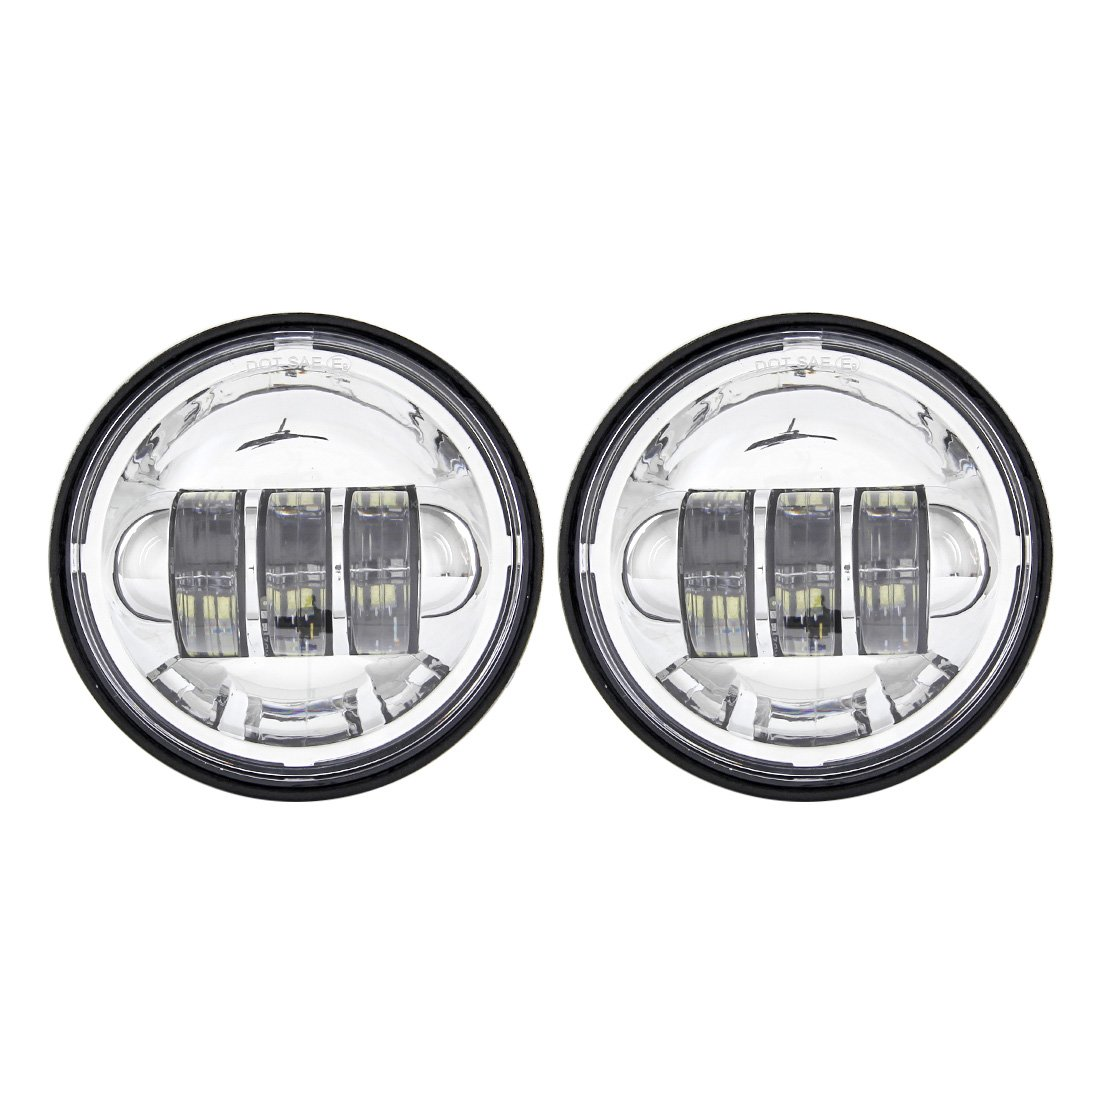 2PCS Cromo 4.5 Pollici 30 W LED Nebbia Ausiliario Fari Moto Passing Fog Light Lamp Per Harley Davidson